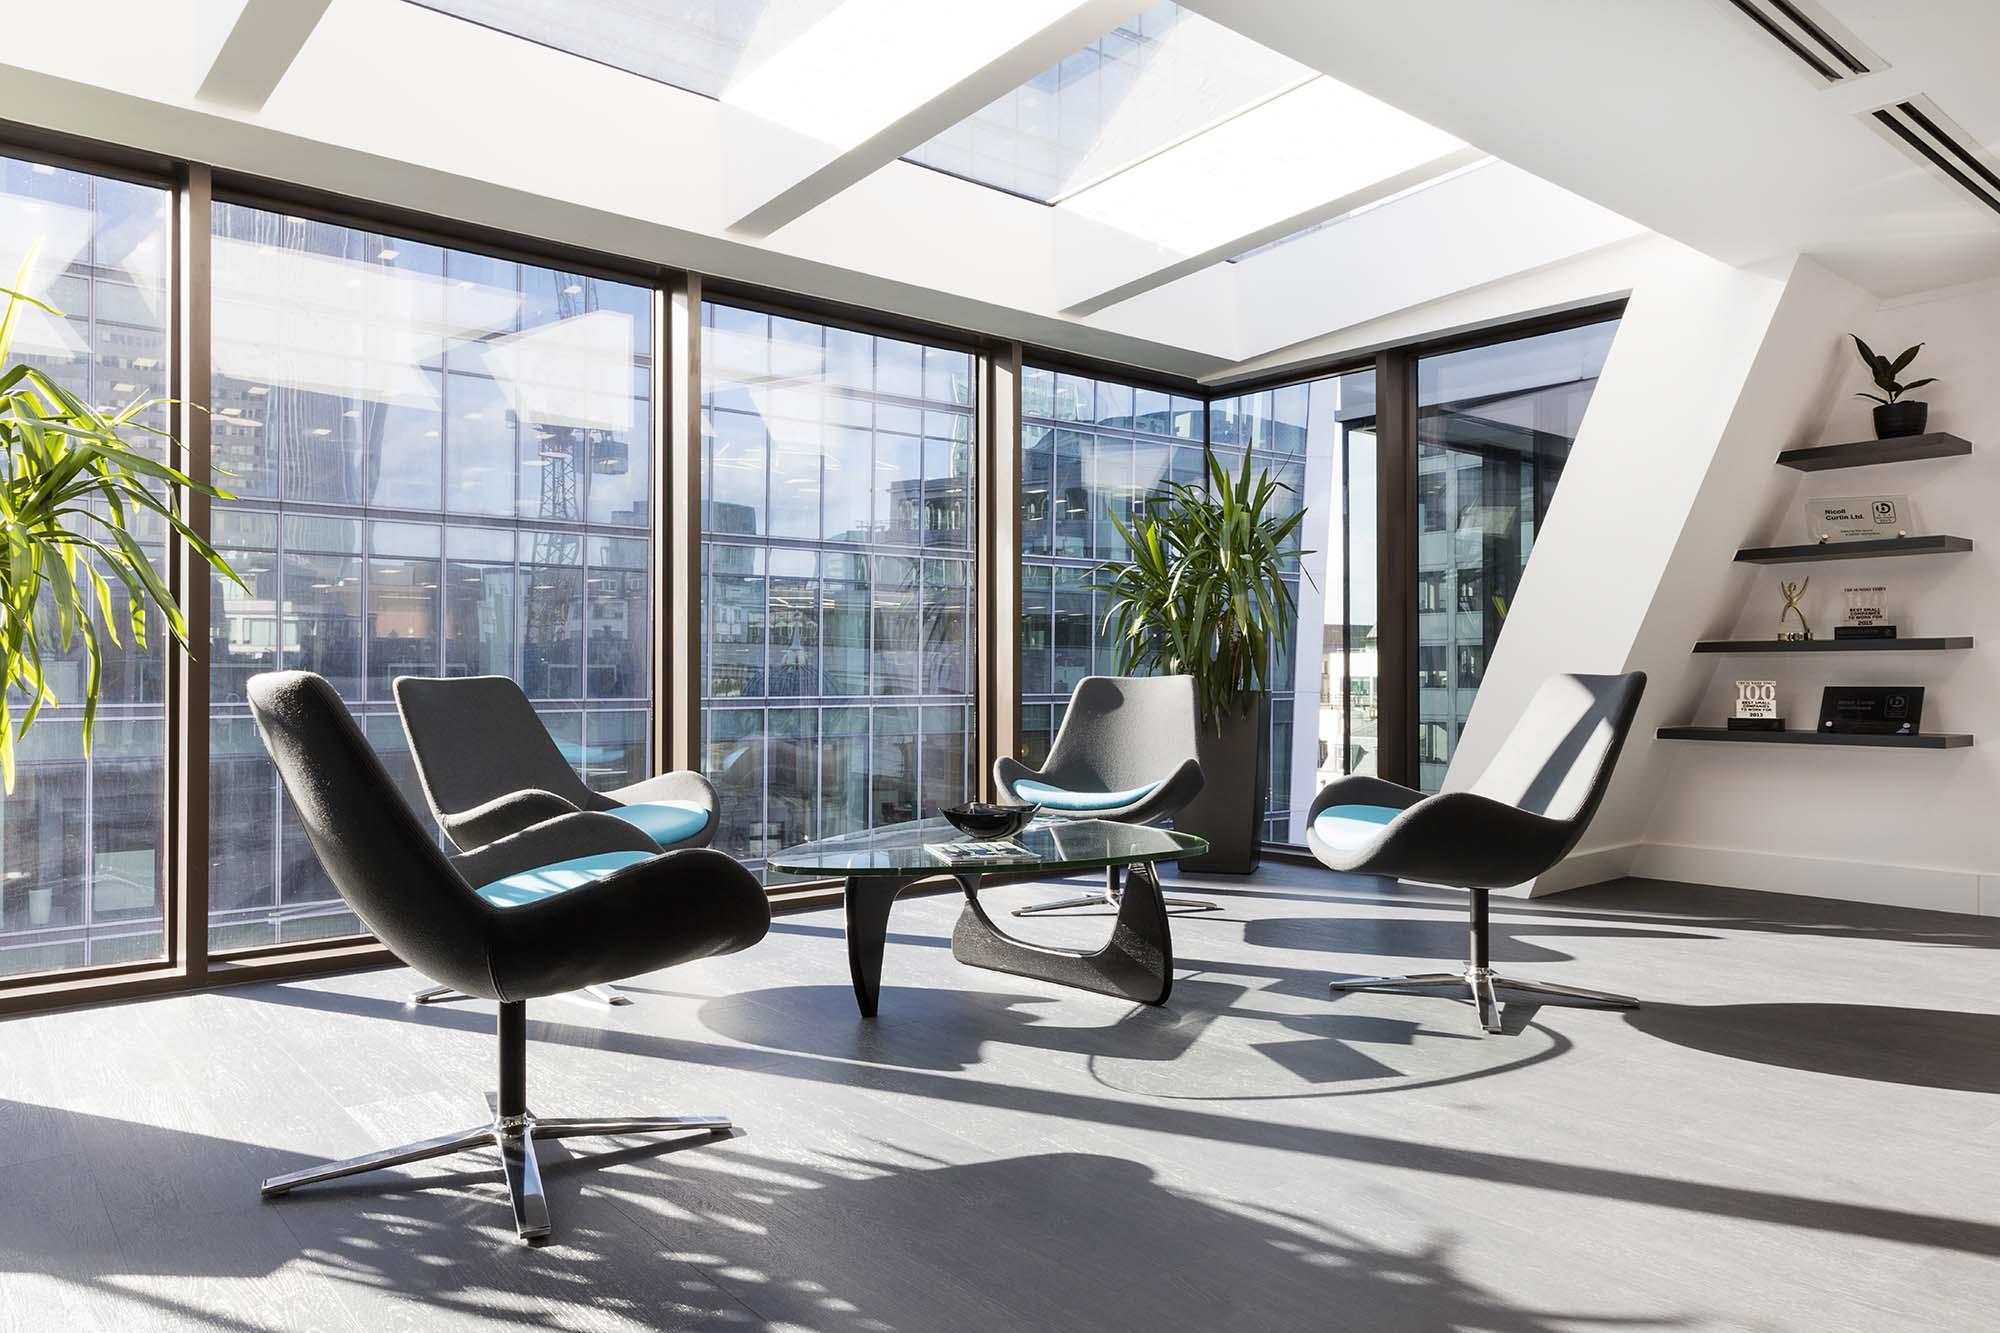 A Peek Inside Nicoll Curtin's New London Office